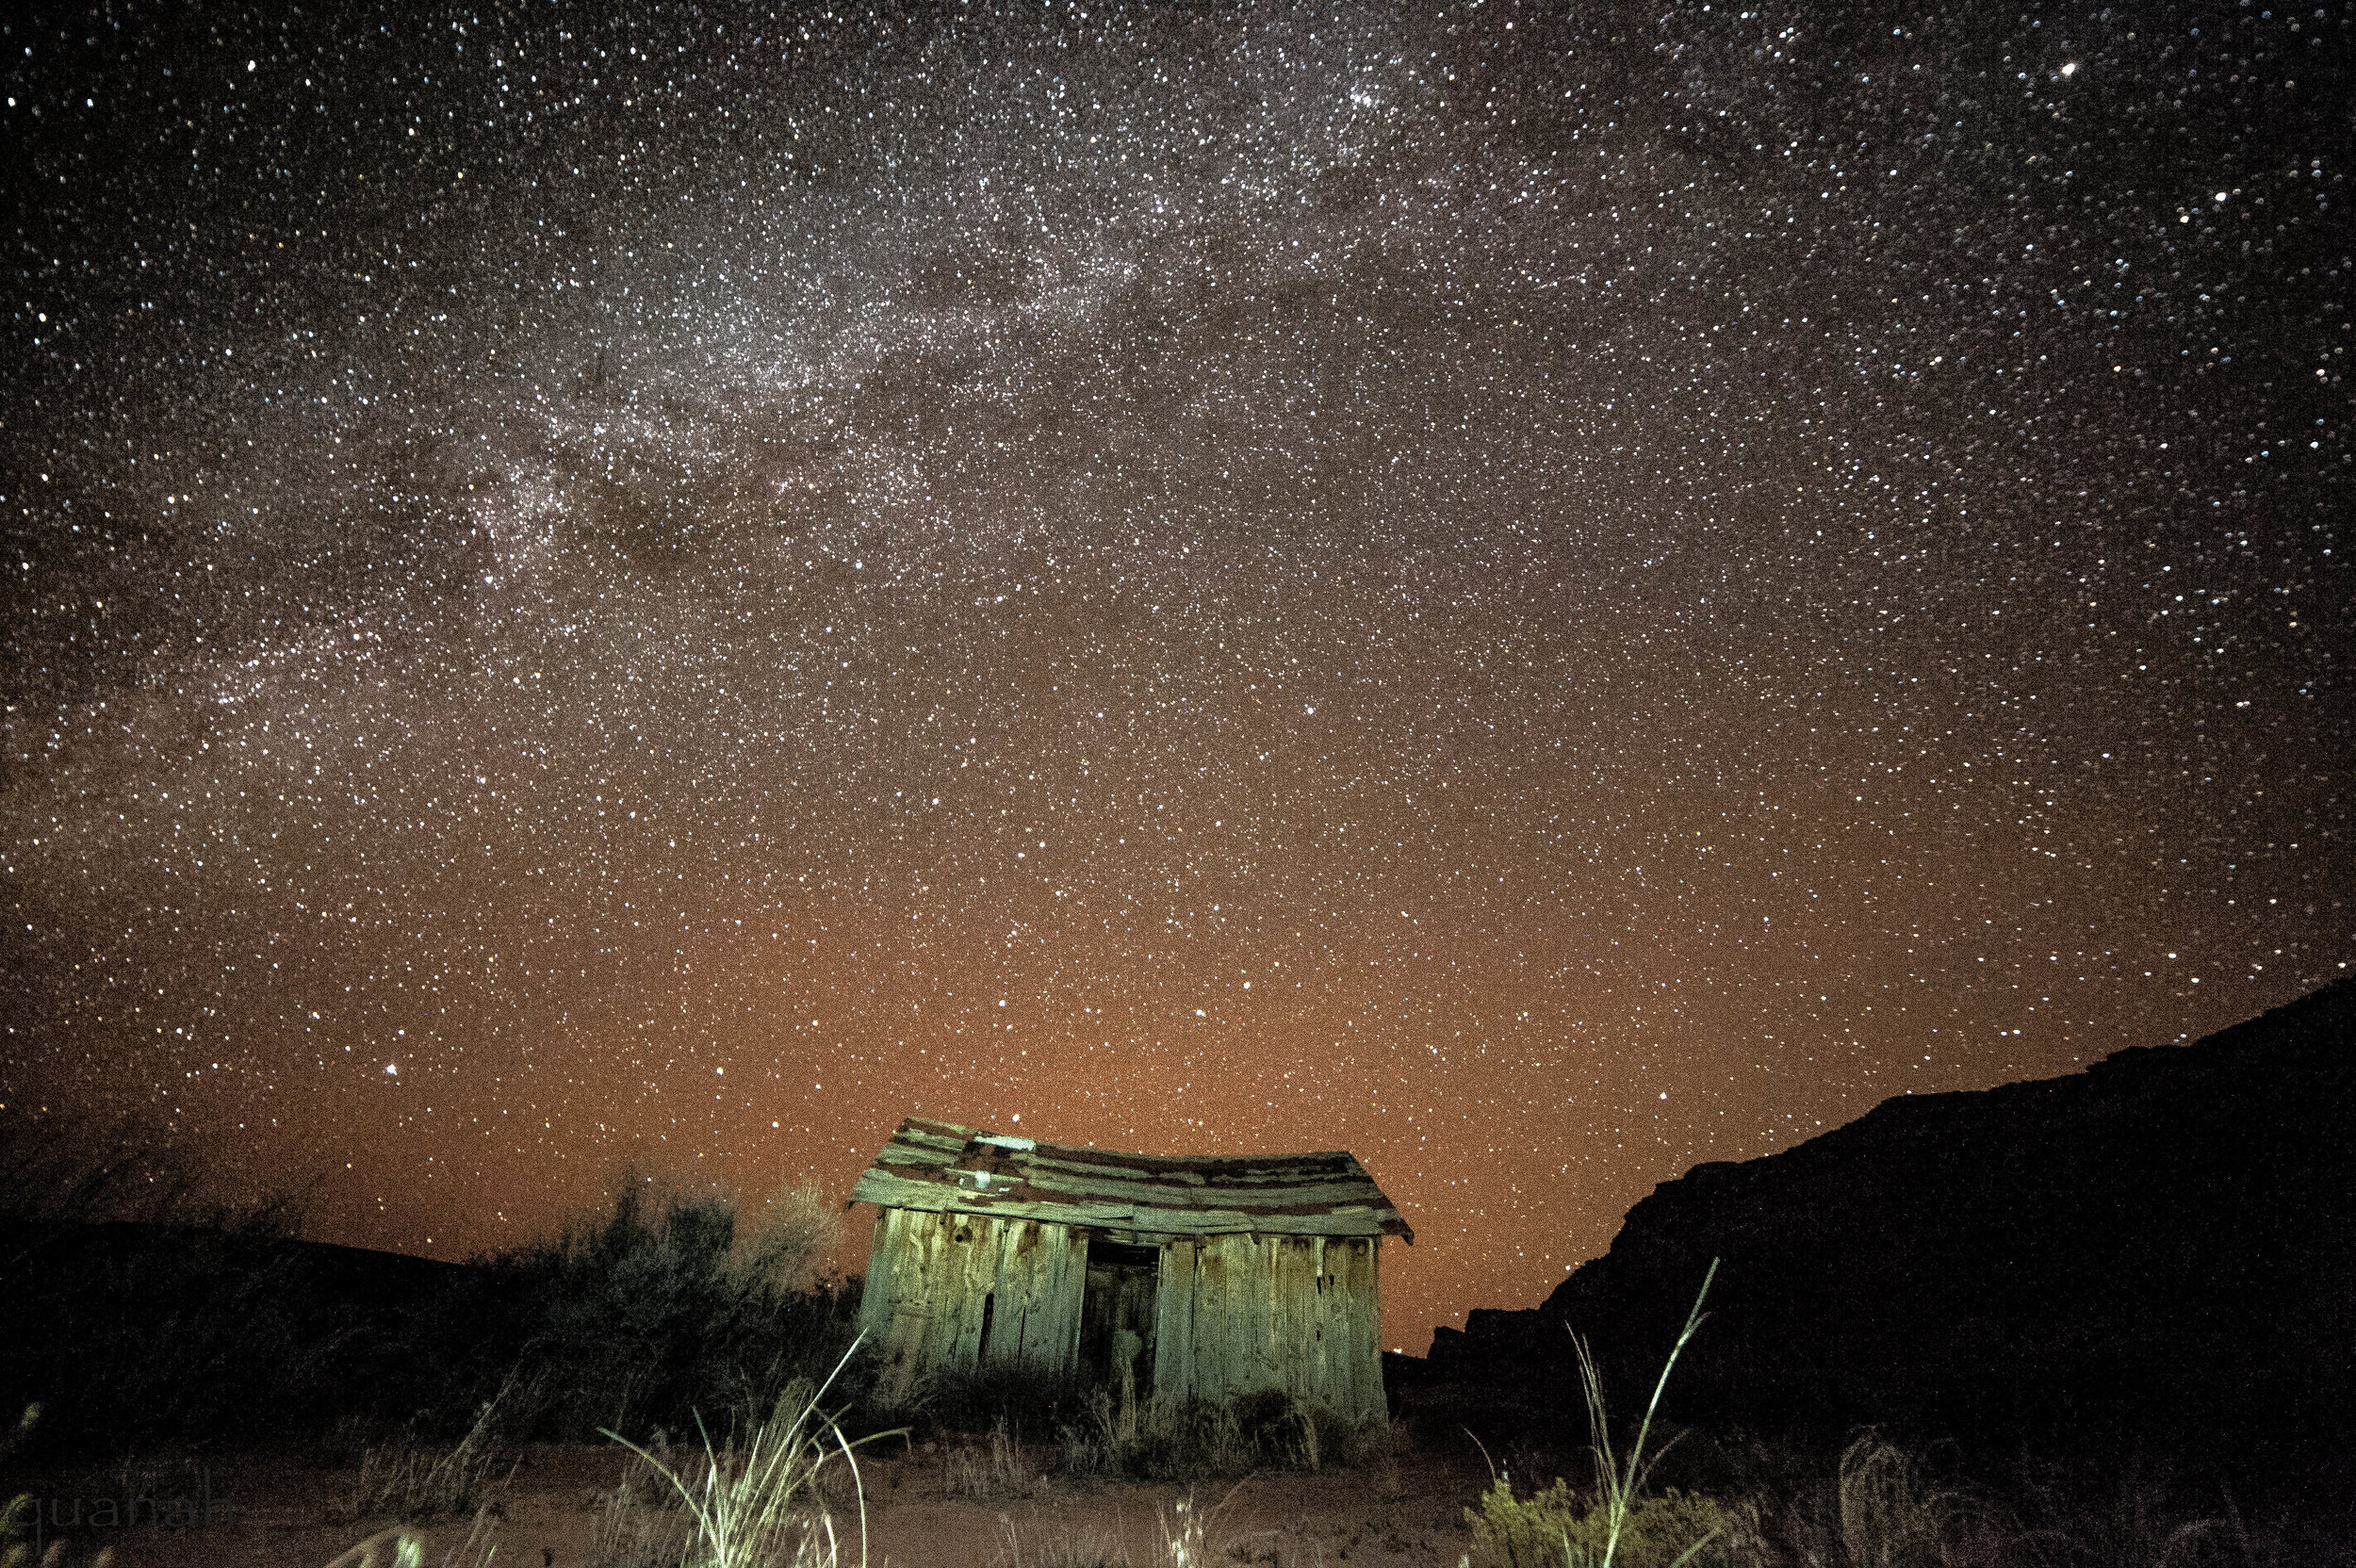 Country Life at Night